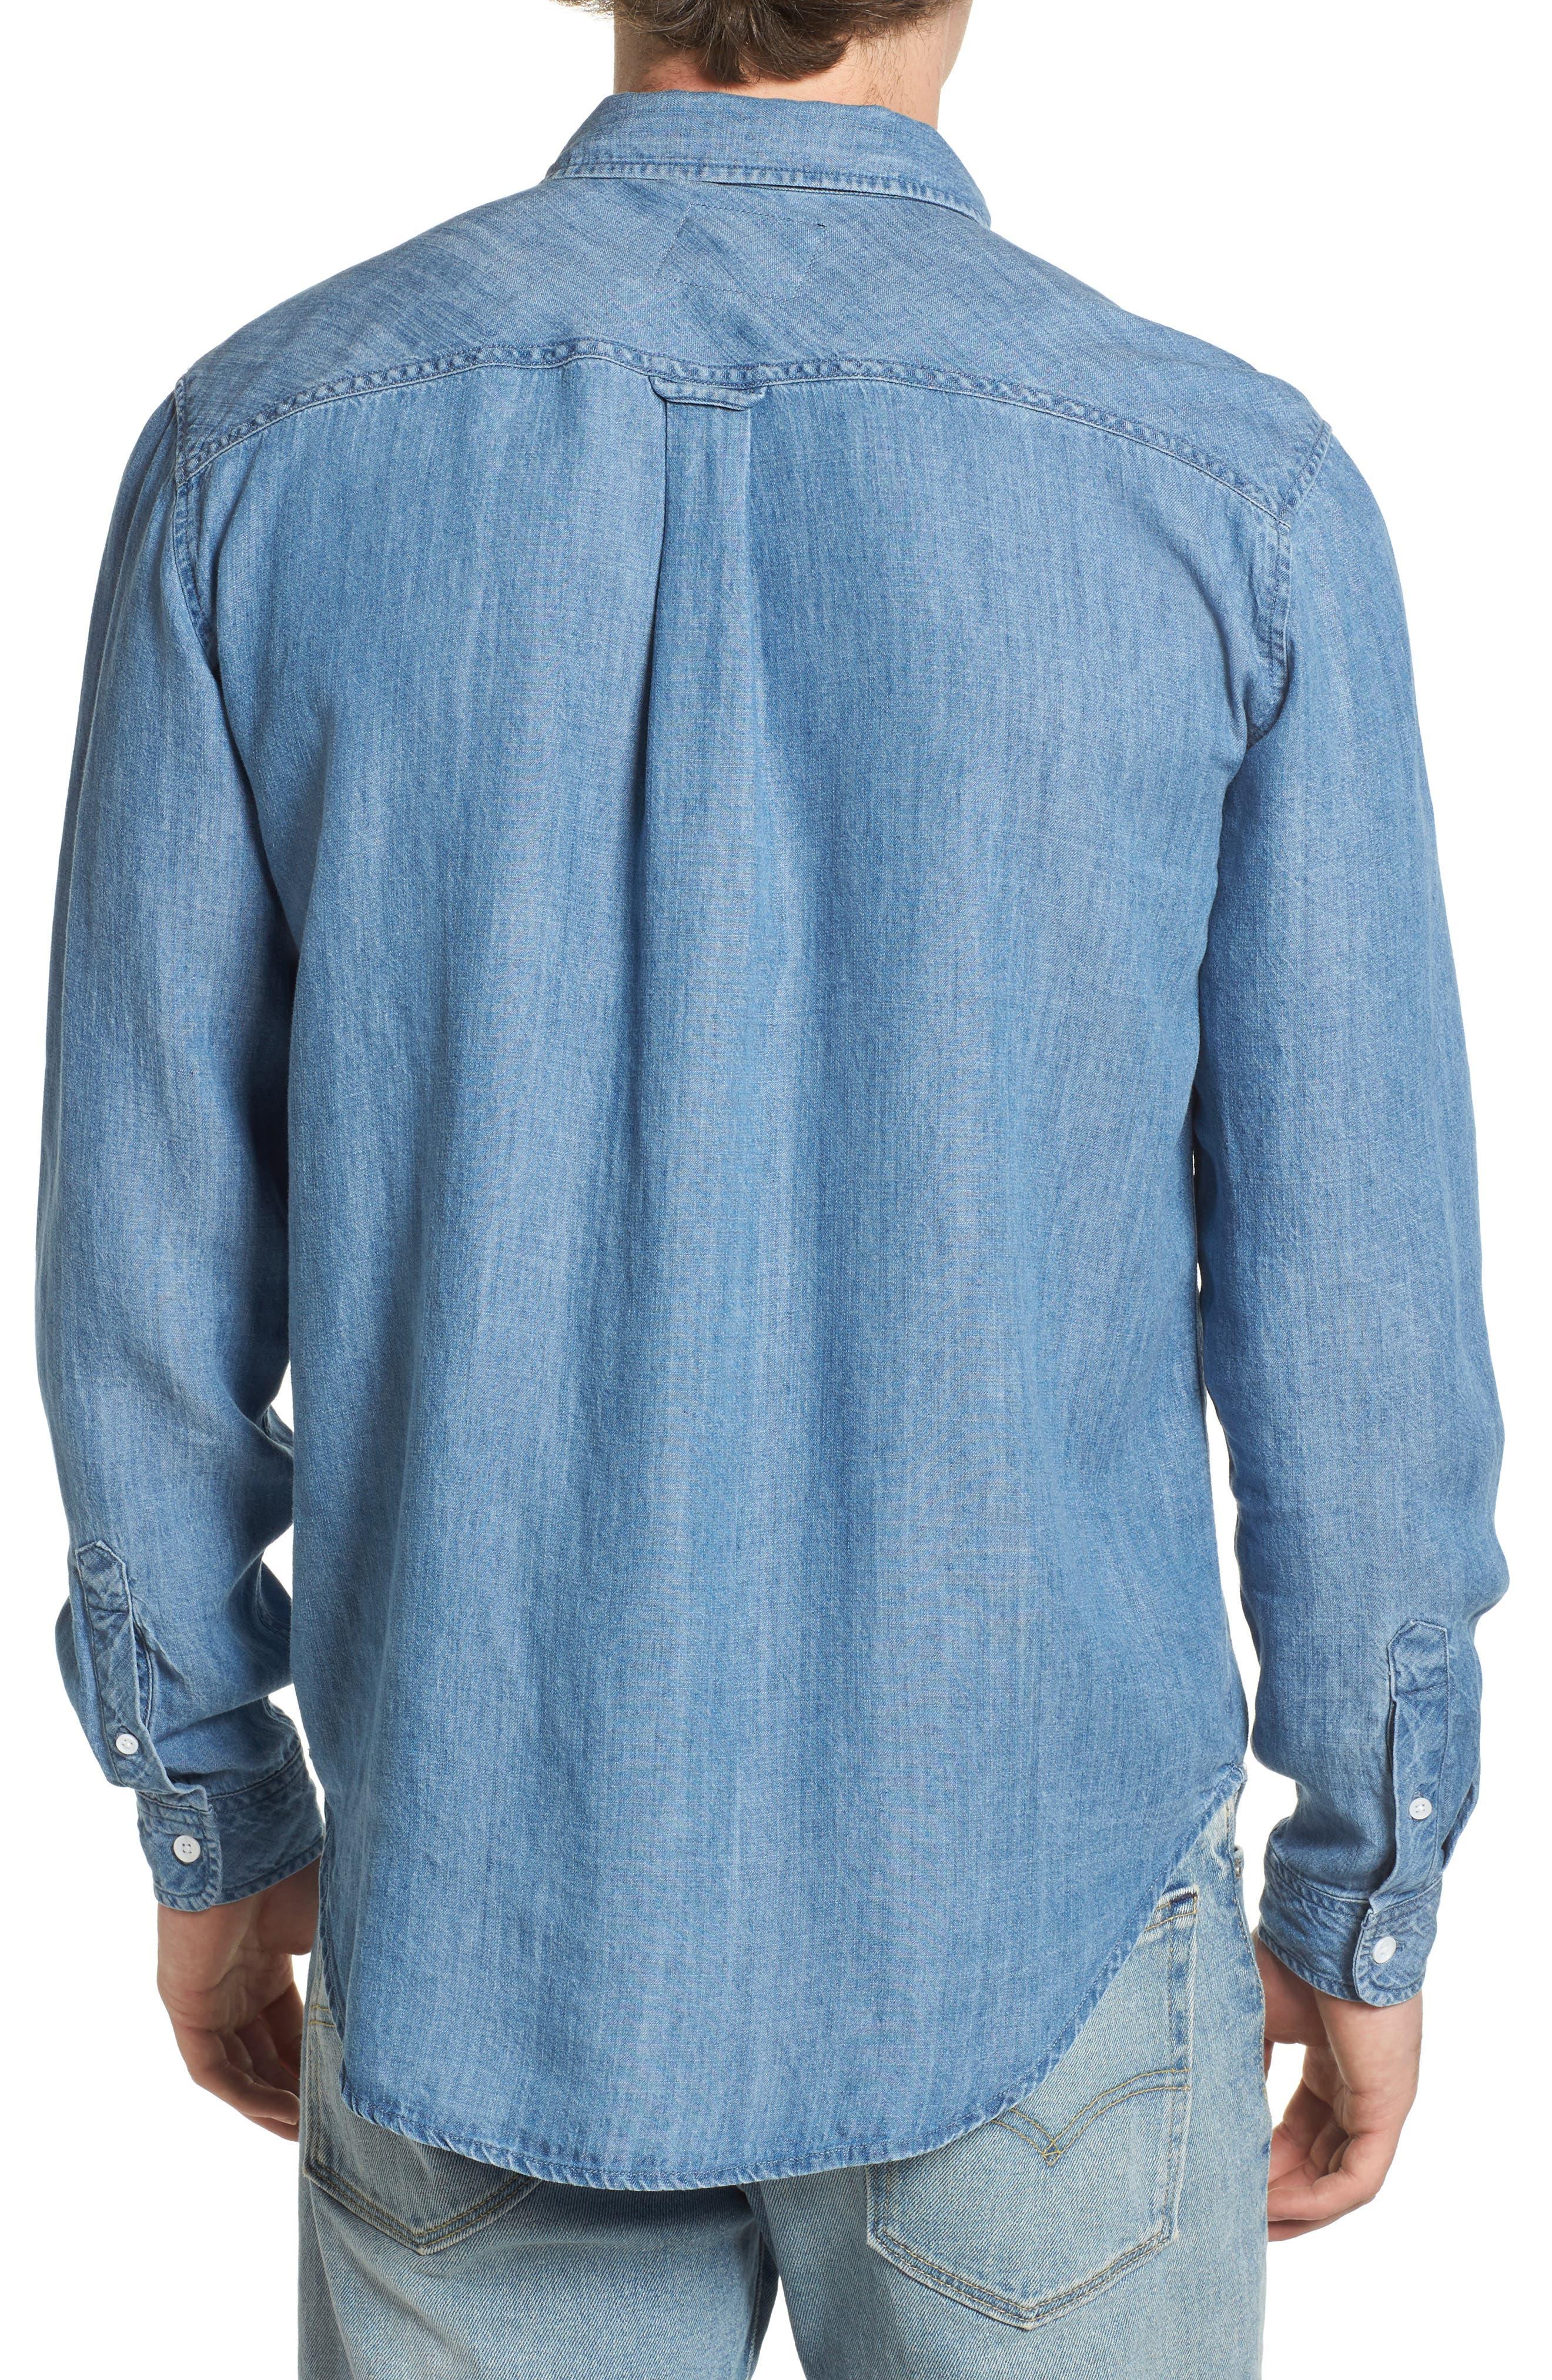 Colton Denim Shirt,                             Alternate thumbnail 2, color,                             MEDIUM VINTAGE WASH